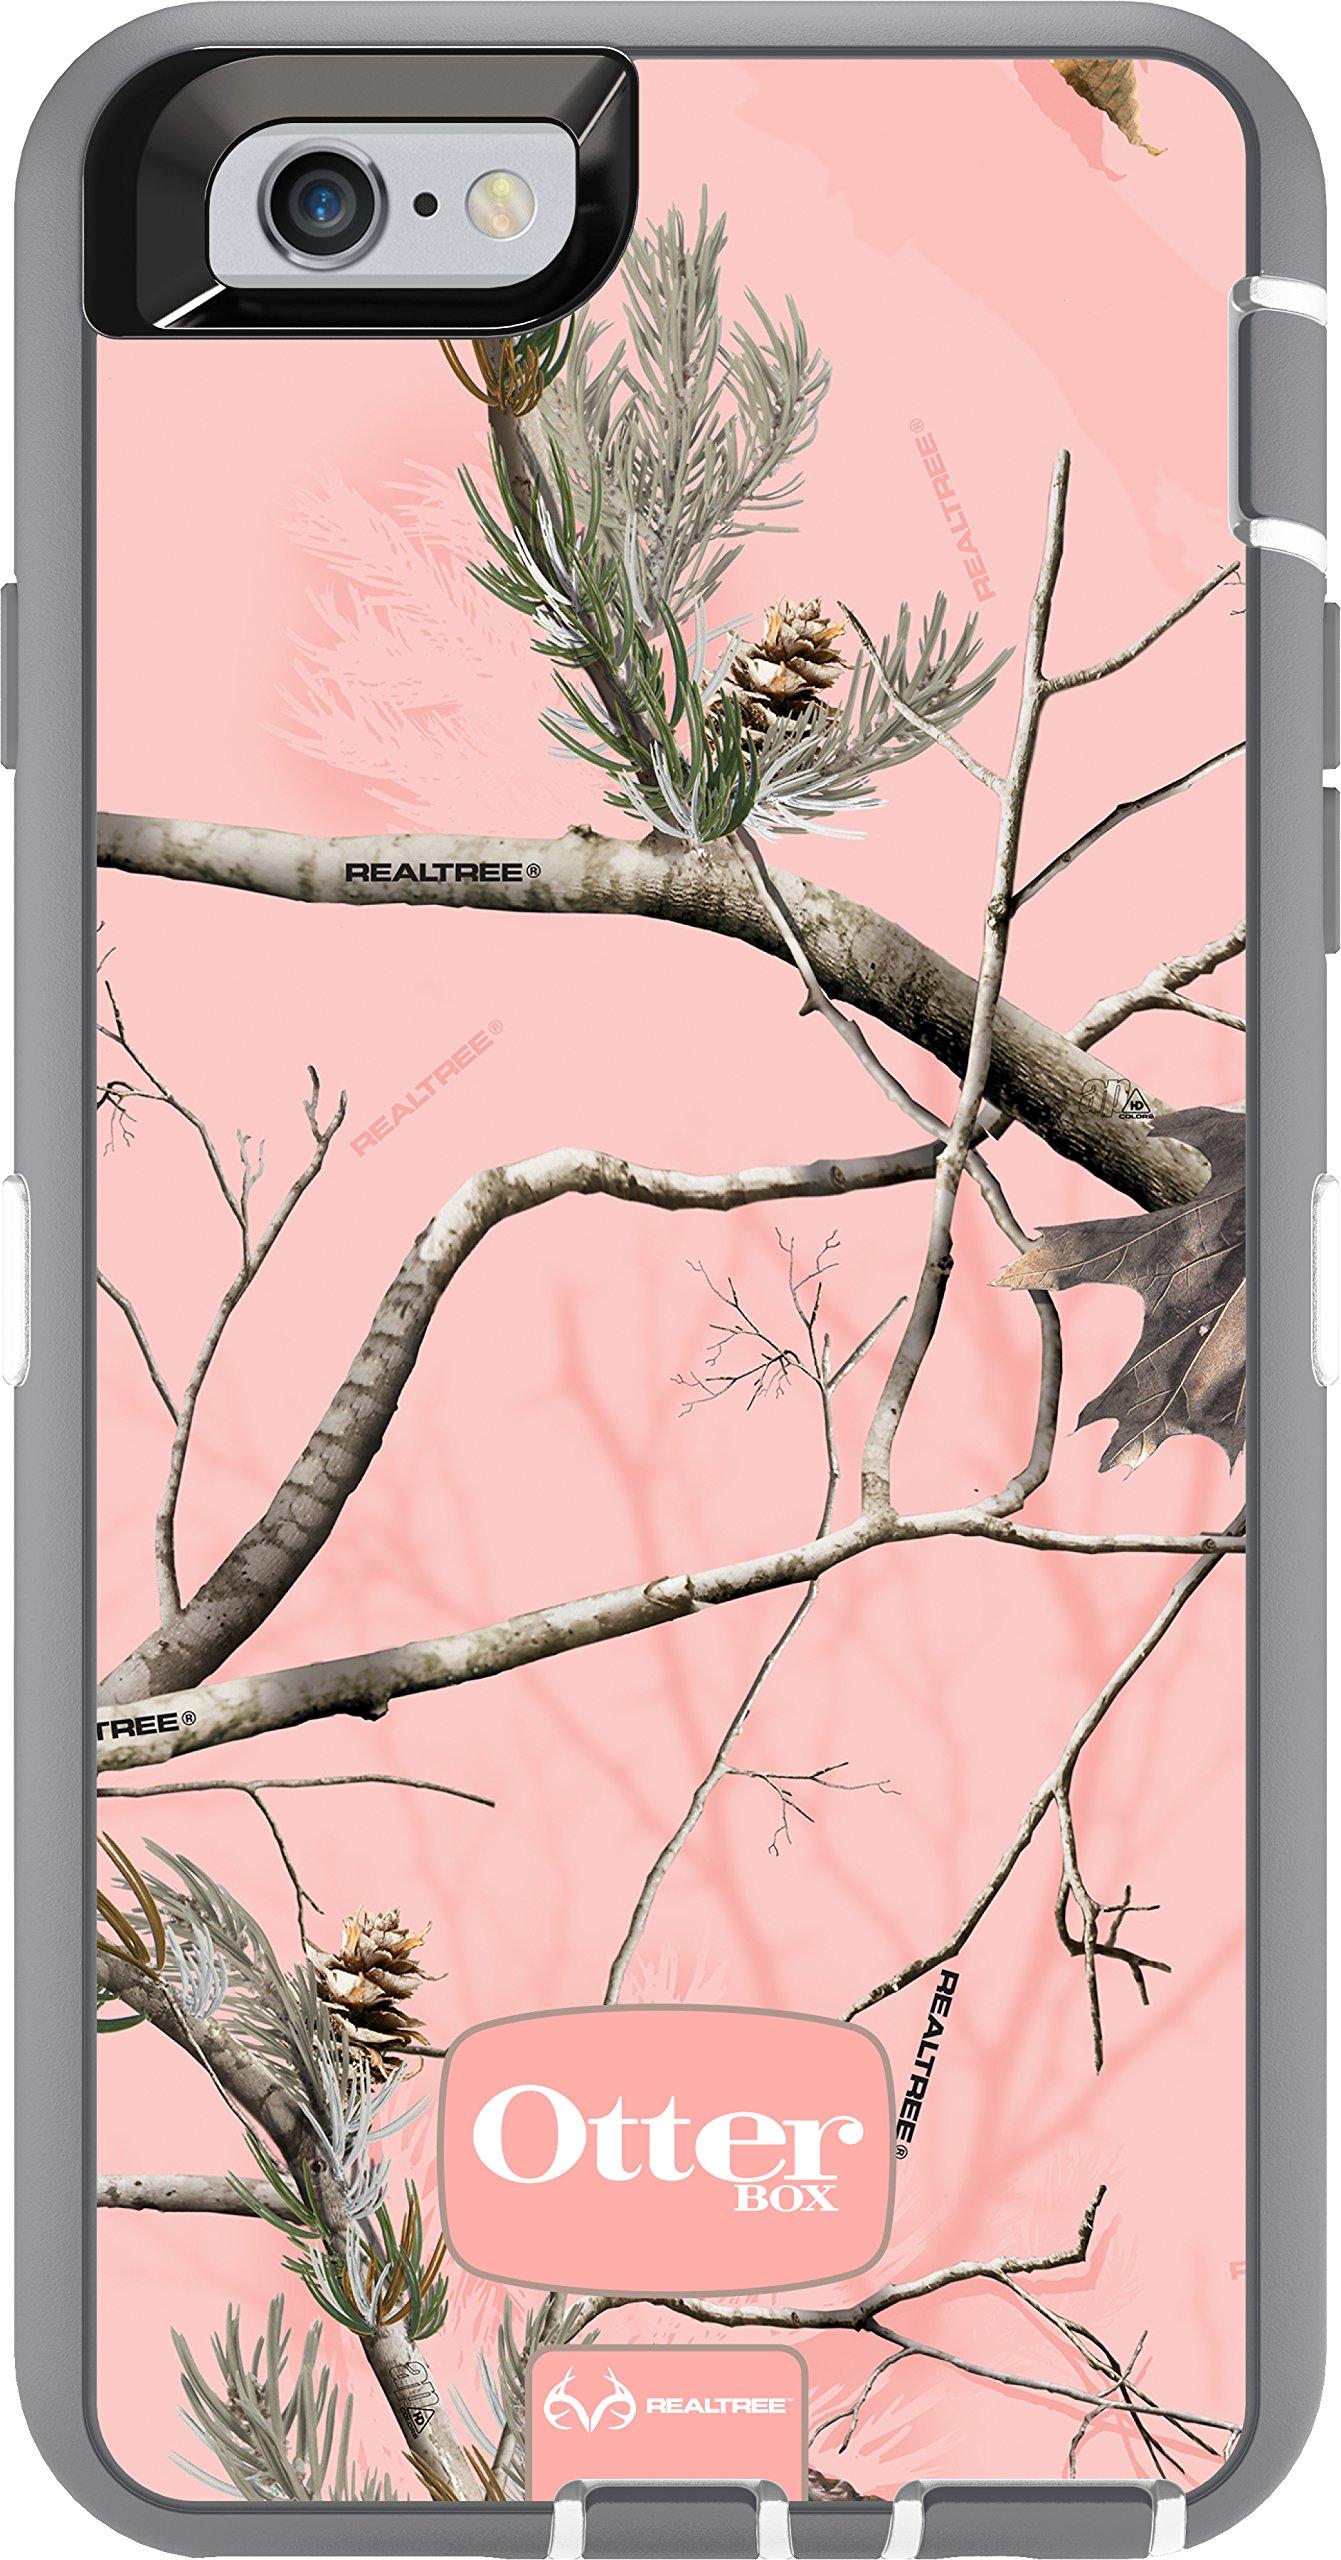 OtterBox iPhone 6 ONLY Case - Defender Series, Retail Packaging - Ap Pink (White/Gunmetal Grey Ap Pink) (4.7 inch)